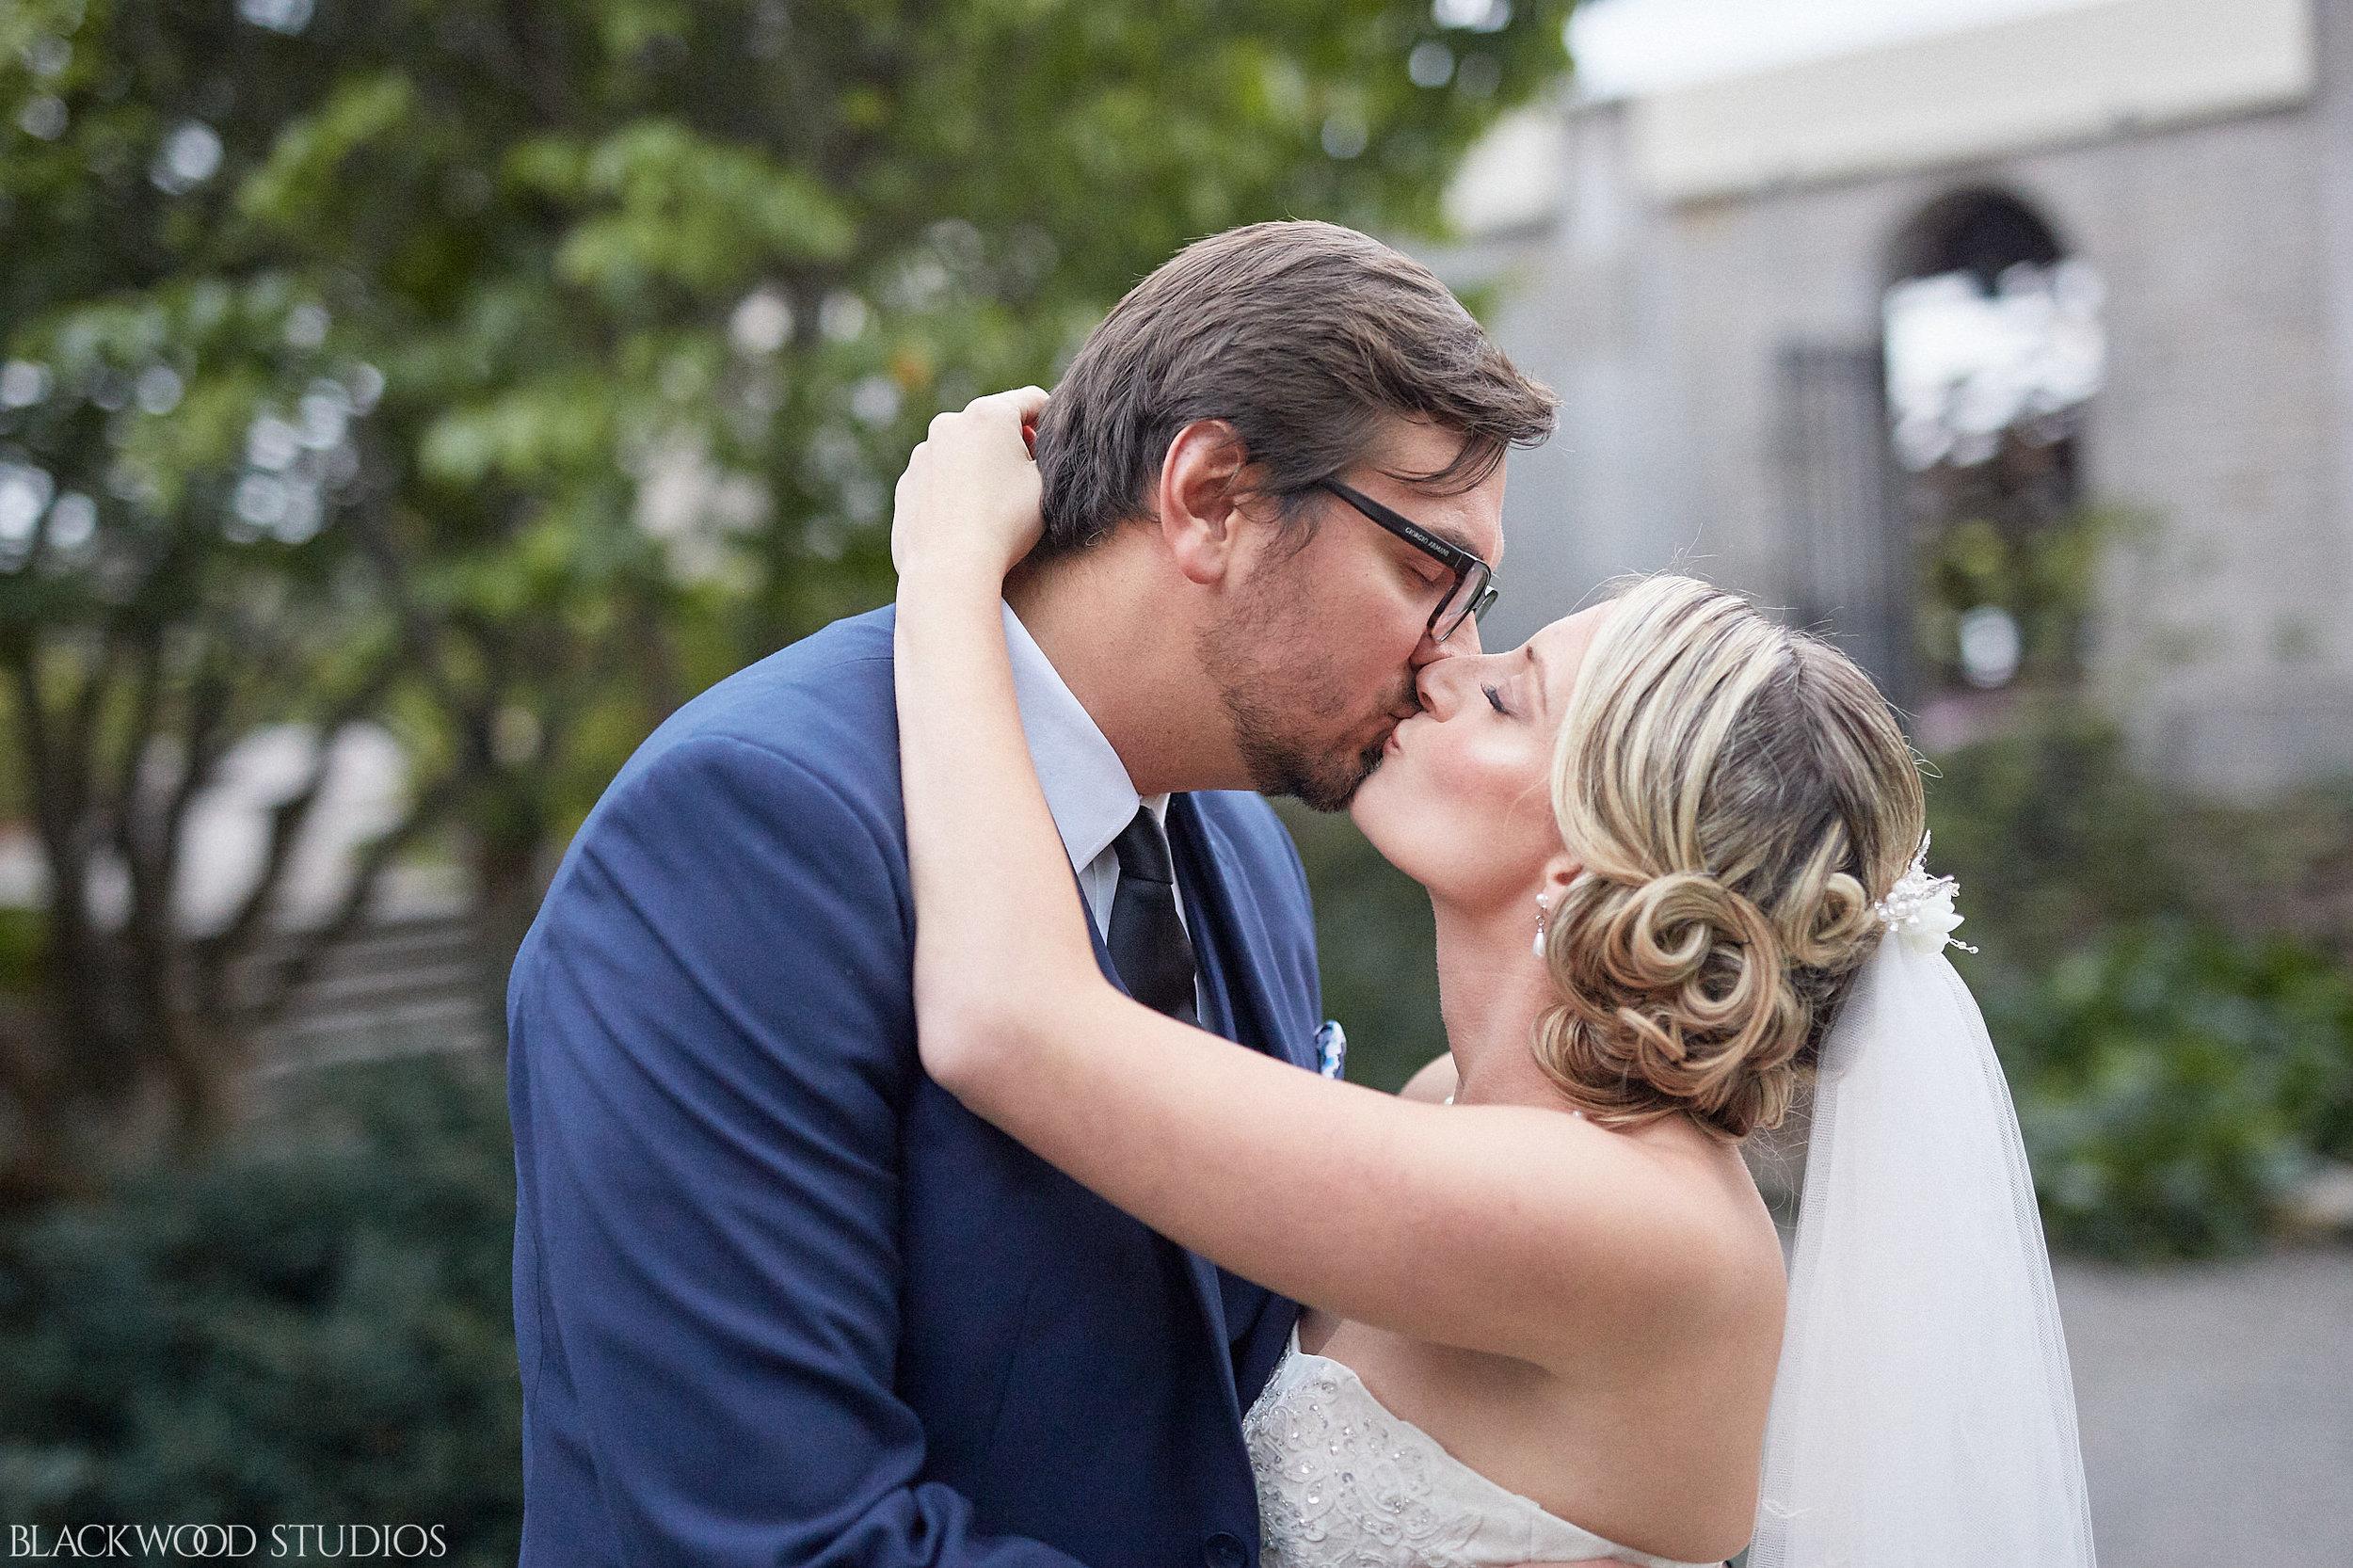 Blackwood-Studios-Wedding-Photography-20170928-184743-Marek-Katie-Michalek-Oakes-Garden-Theatre-Niagara-Falls-Ontario-Canada.jpg